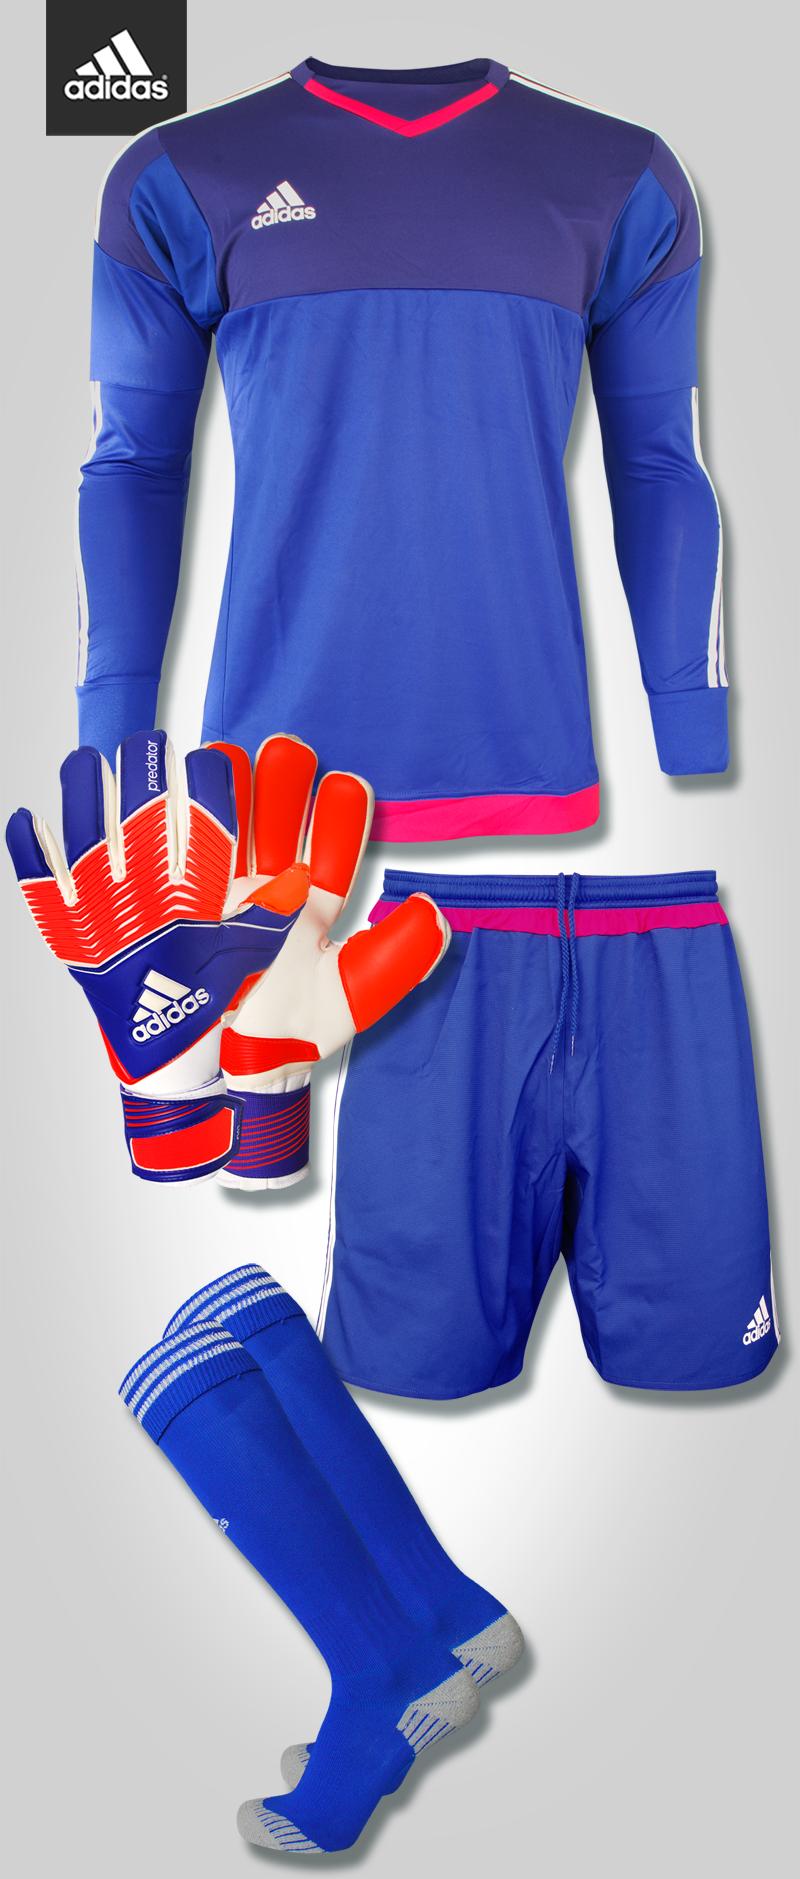 Goalkeeper Set Adidas Top 15 Completo per portieri  9e1c7edd2420